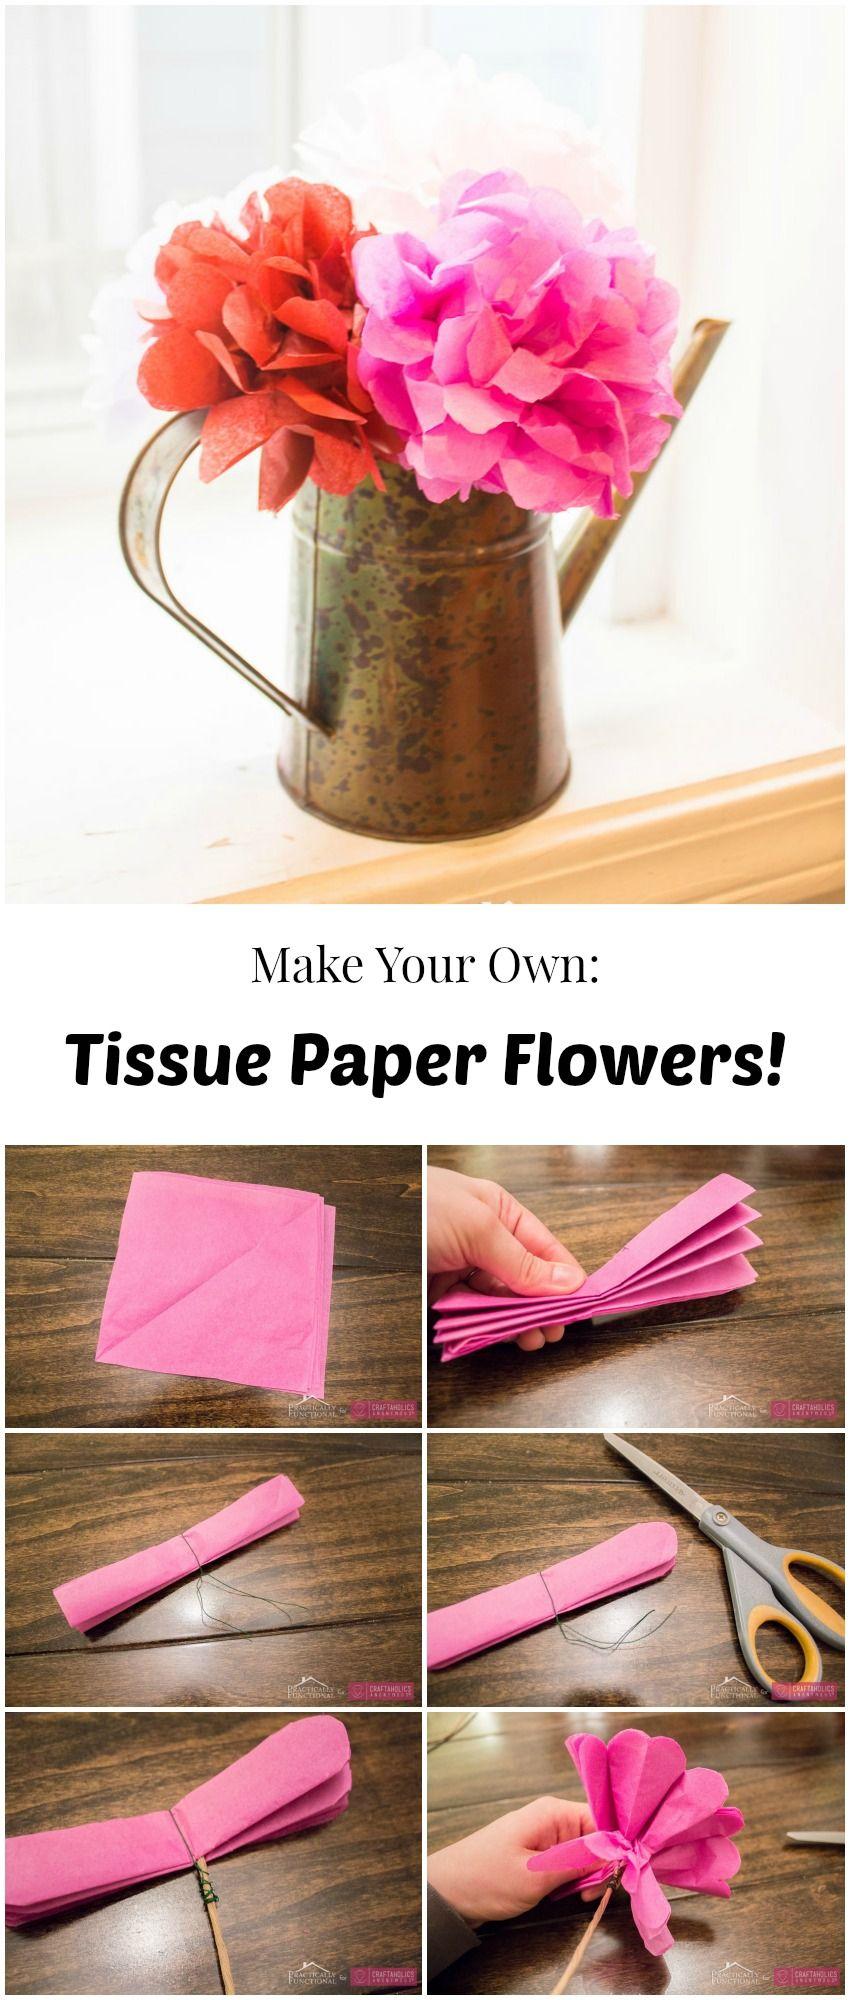 Diy Tissue Paper Flowers Tutorial Tissue Paper Tissue Paper